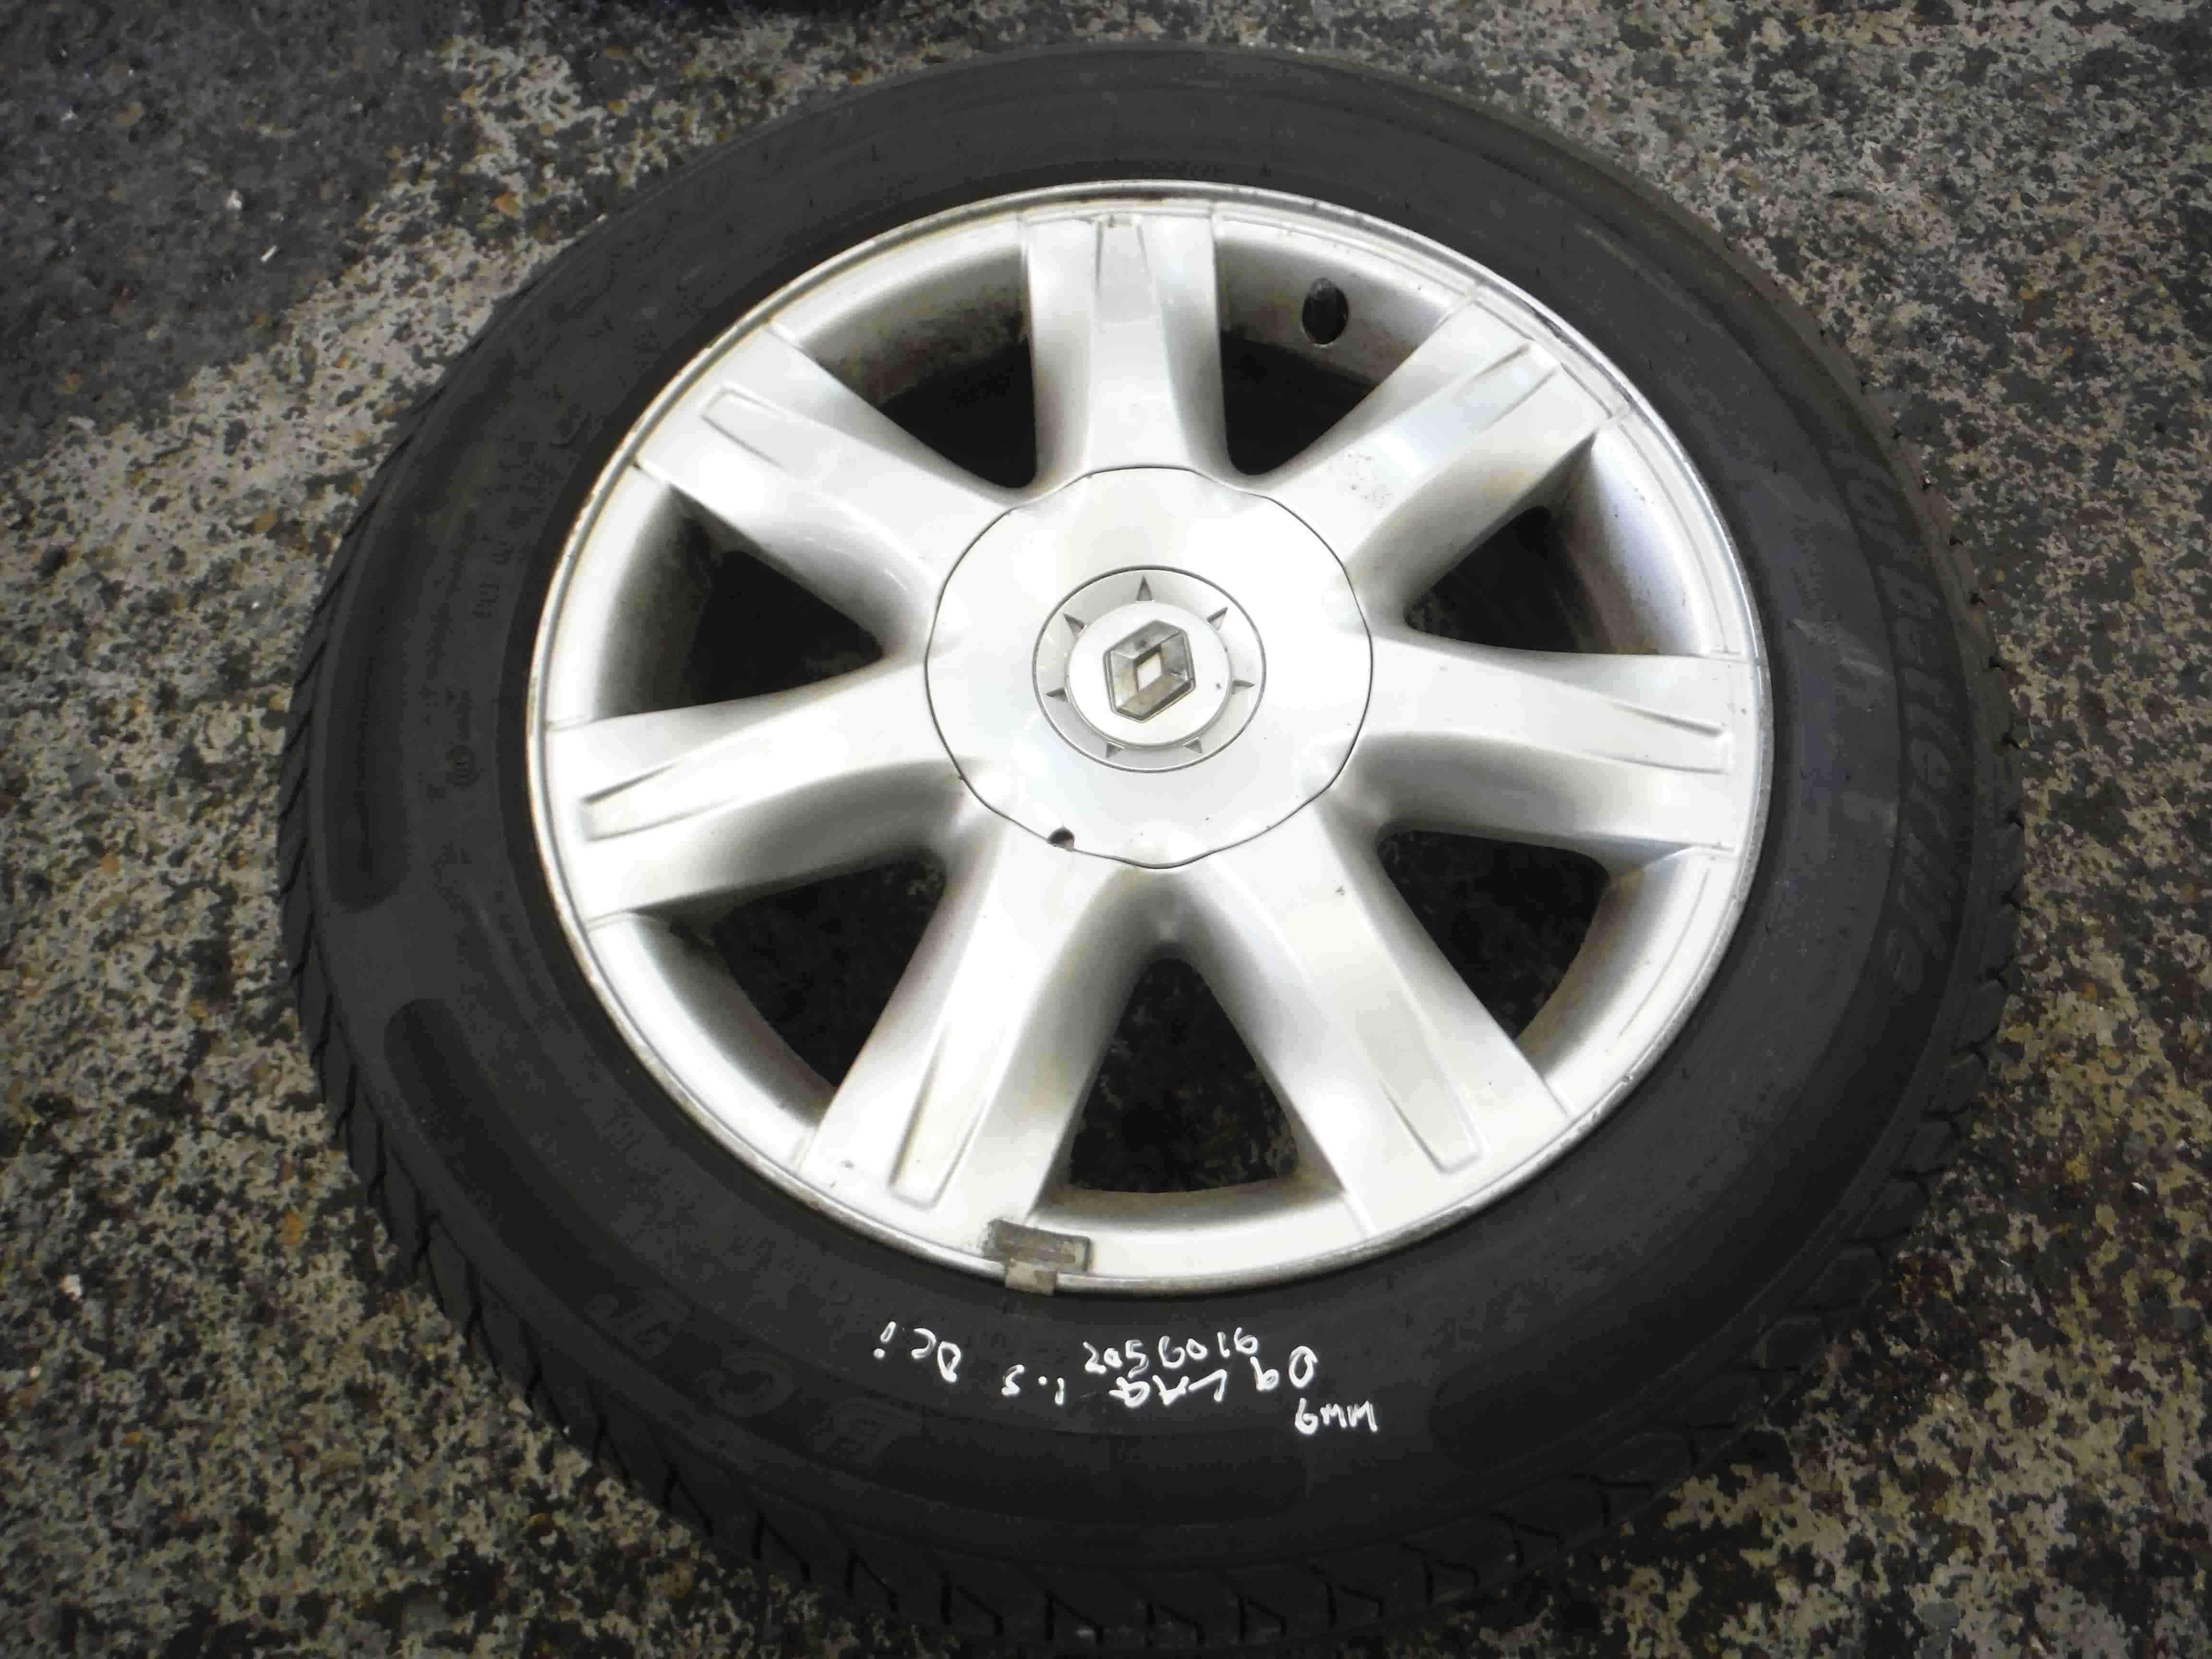 Renault Laguna 2007-2010 Alloy Wheel Standard  Tyre 205 60 16 5mm inch Paradise